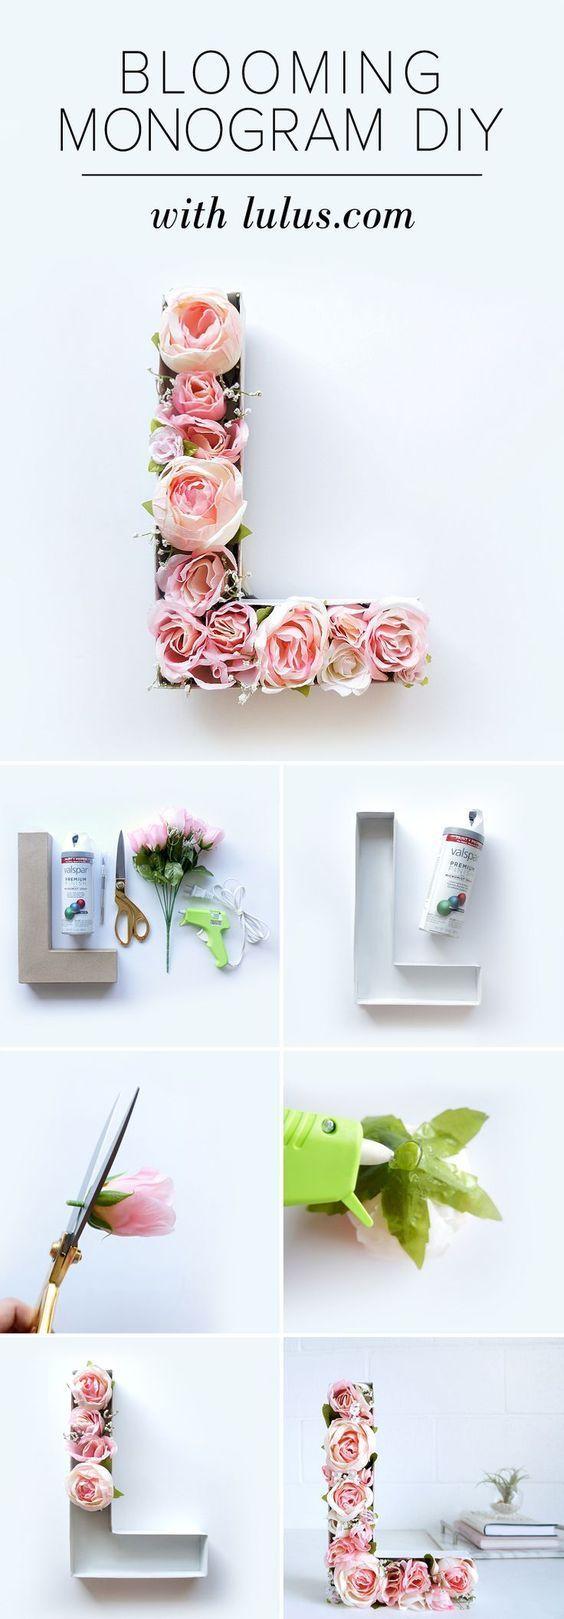 Blooming Monogram DIY | Blooming monogram, Crafts, Diy, crafts